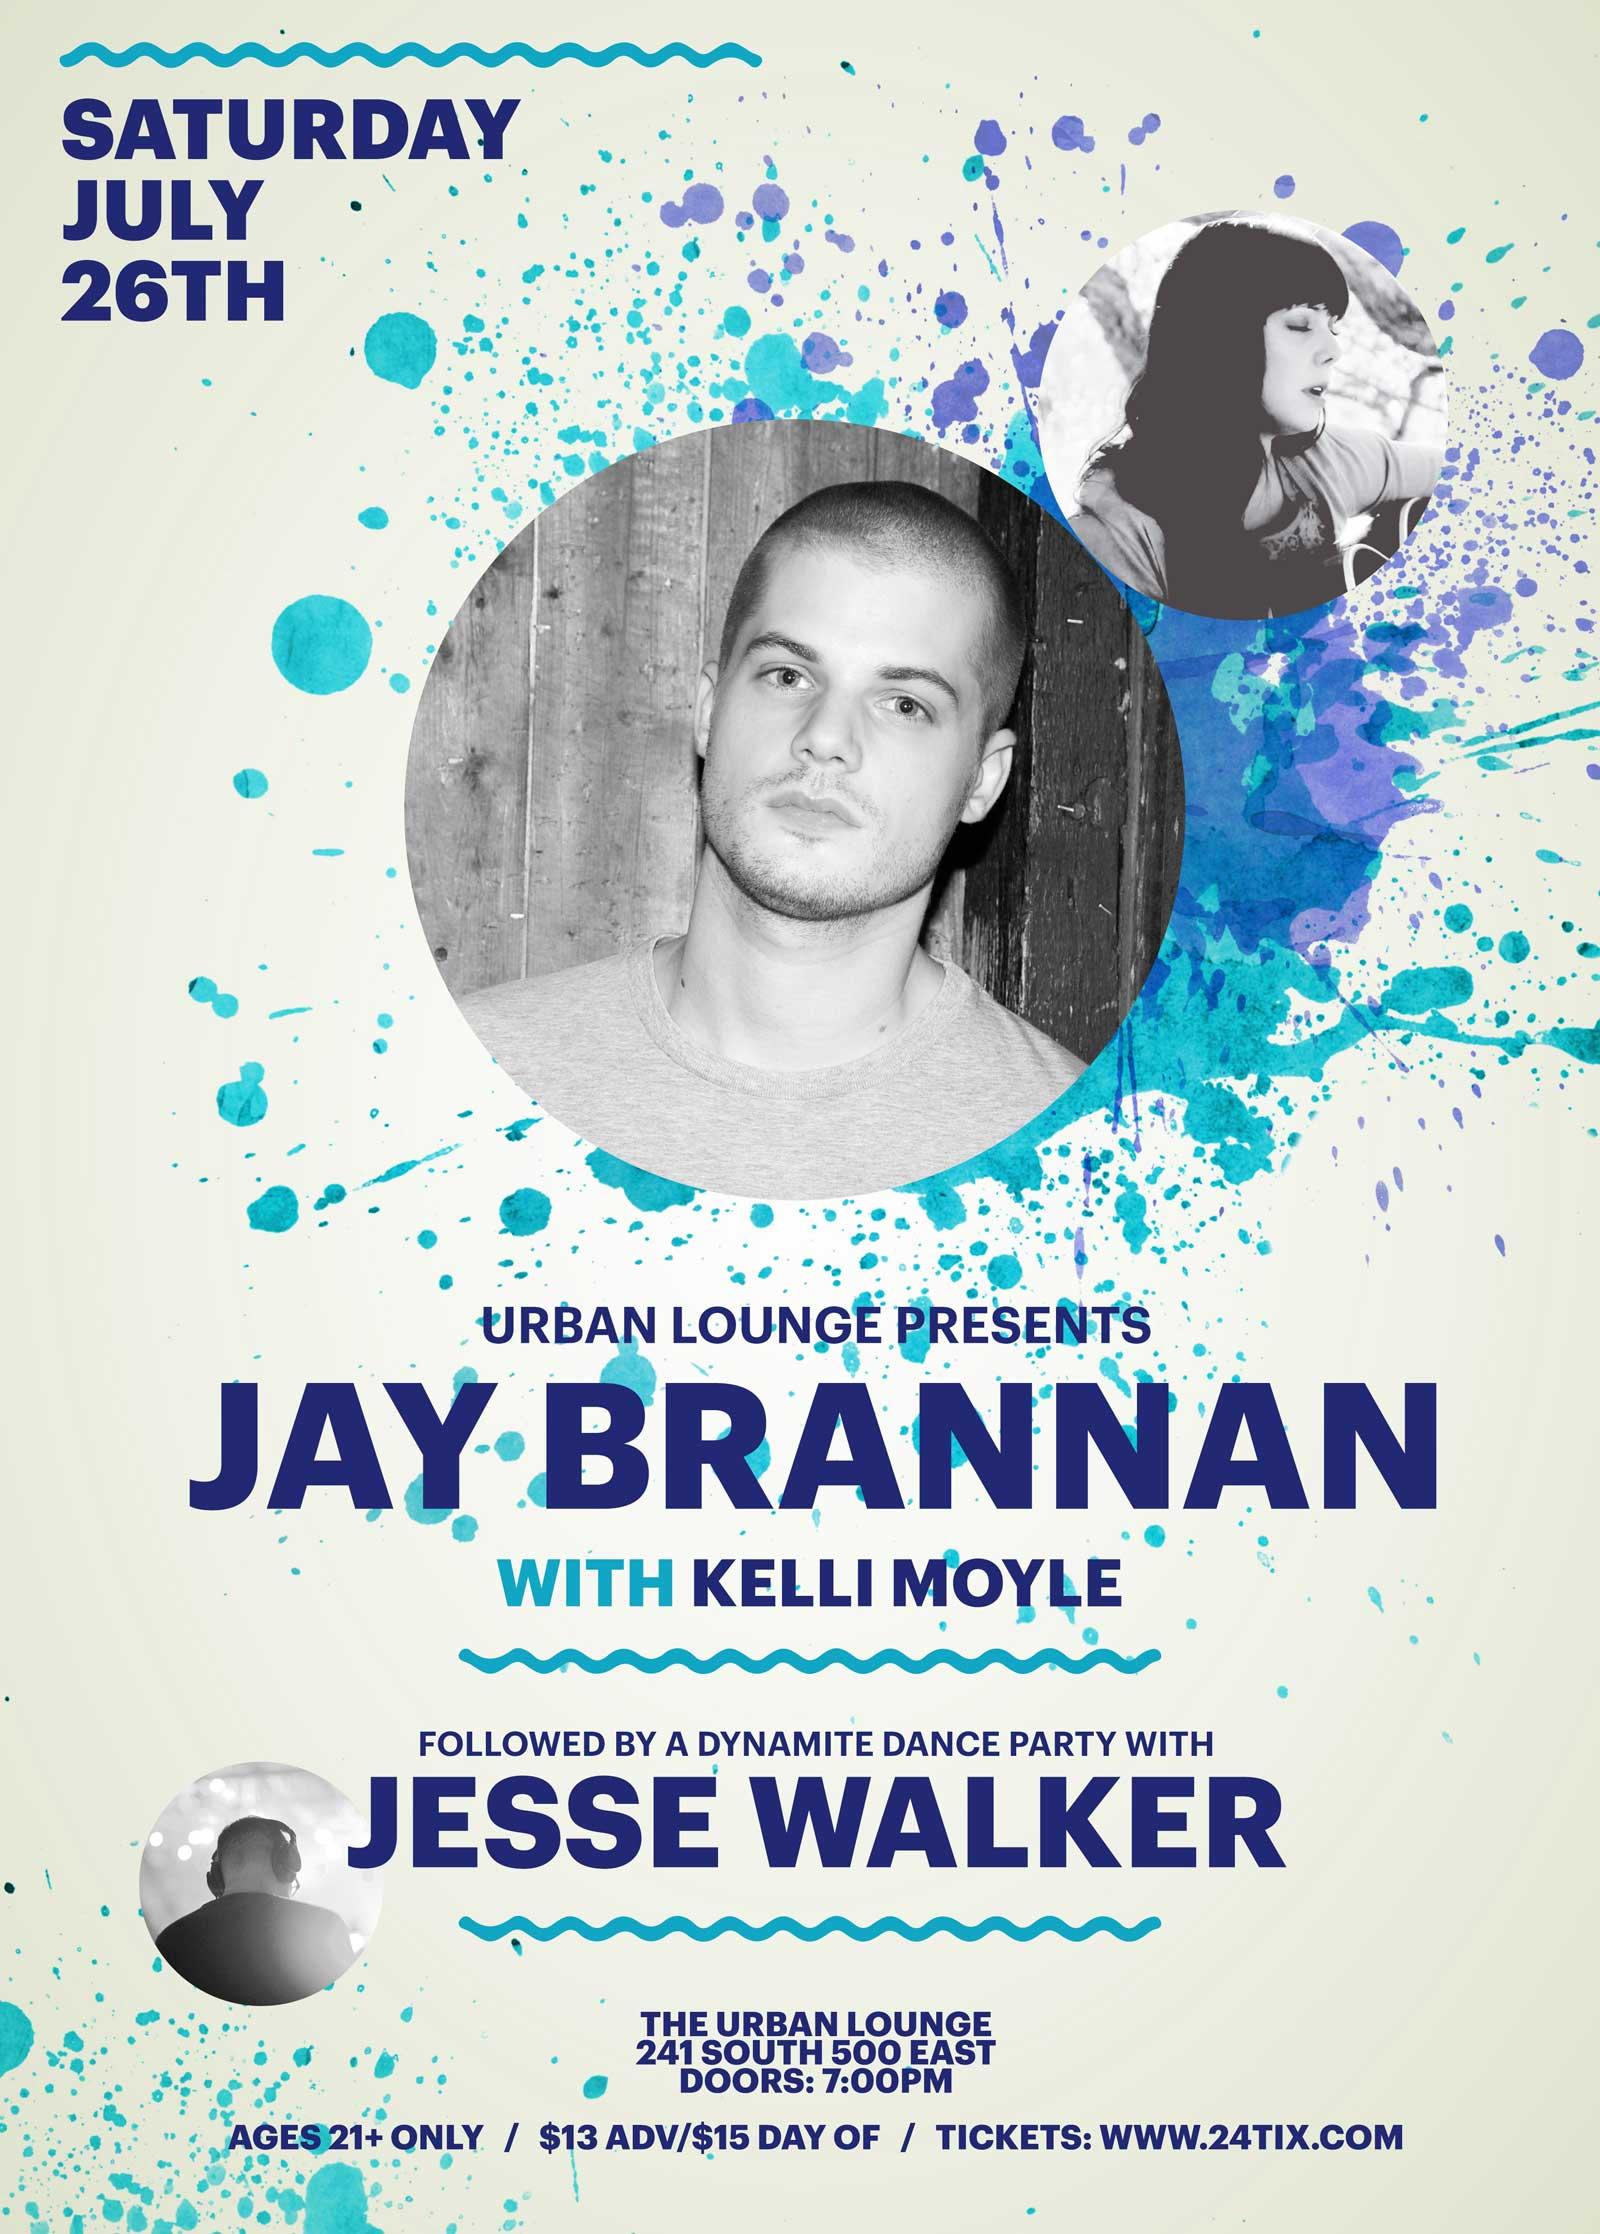 jay-brannan-urban-lounge